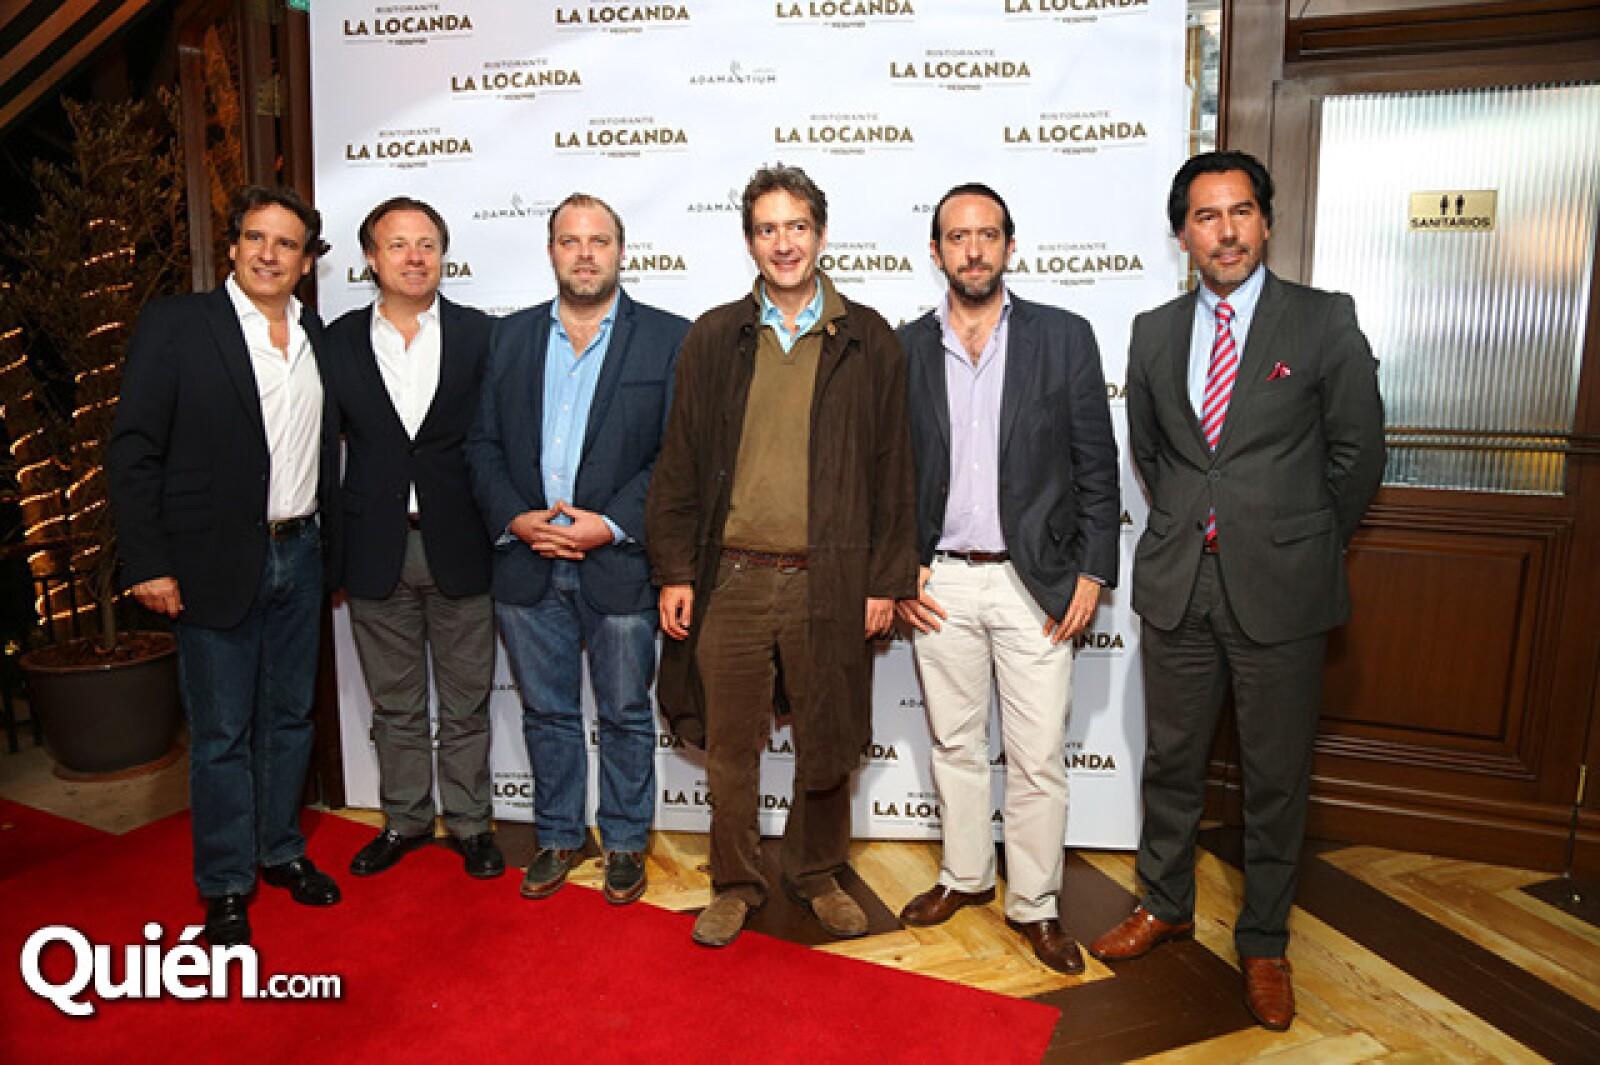 Pedro Roca,Felipe Williamson,Aurelien Julou,Jerónimo Enríquez,Rogelio Enríquez y Ernesto Martínez